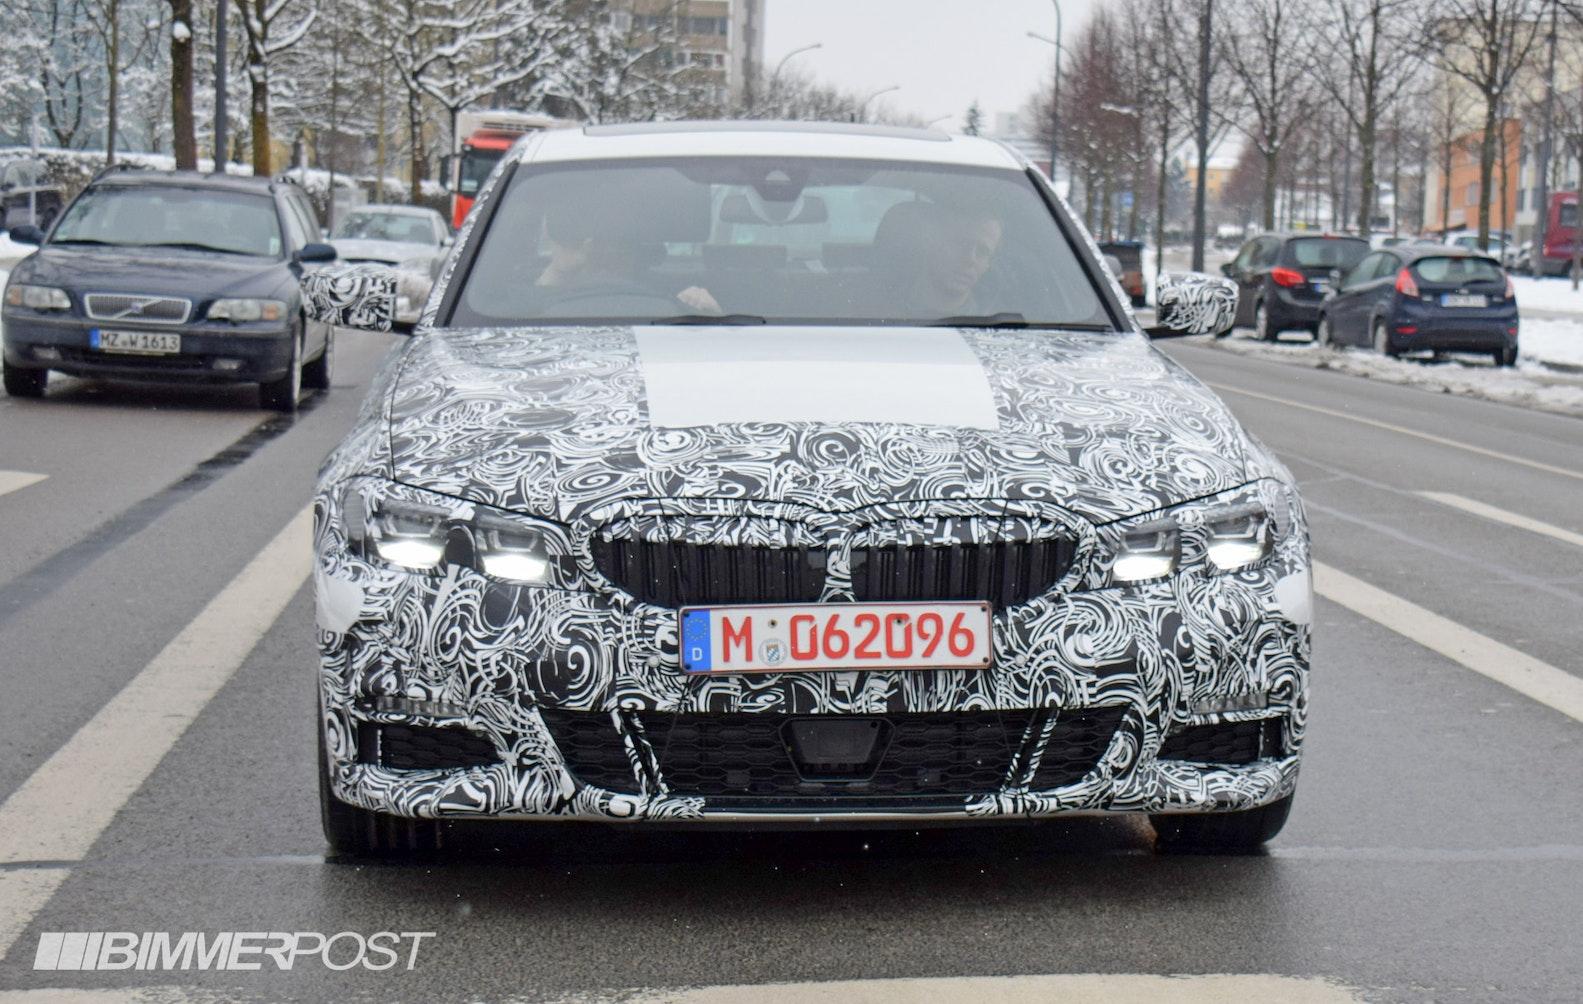 BMW%203%20Less%20camo%201.jpg?w=1583&h=1